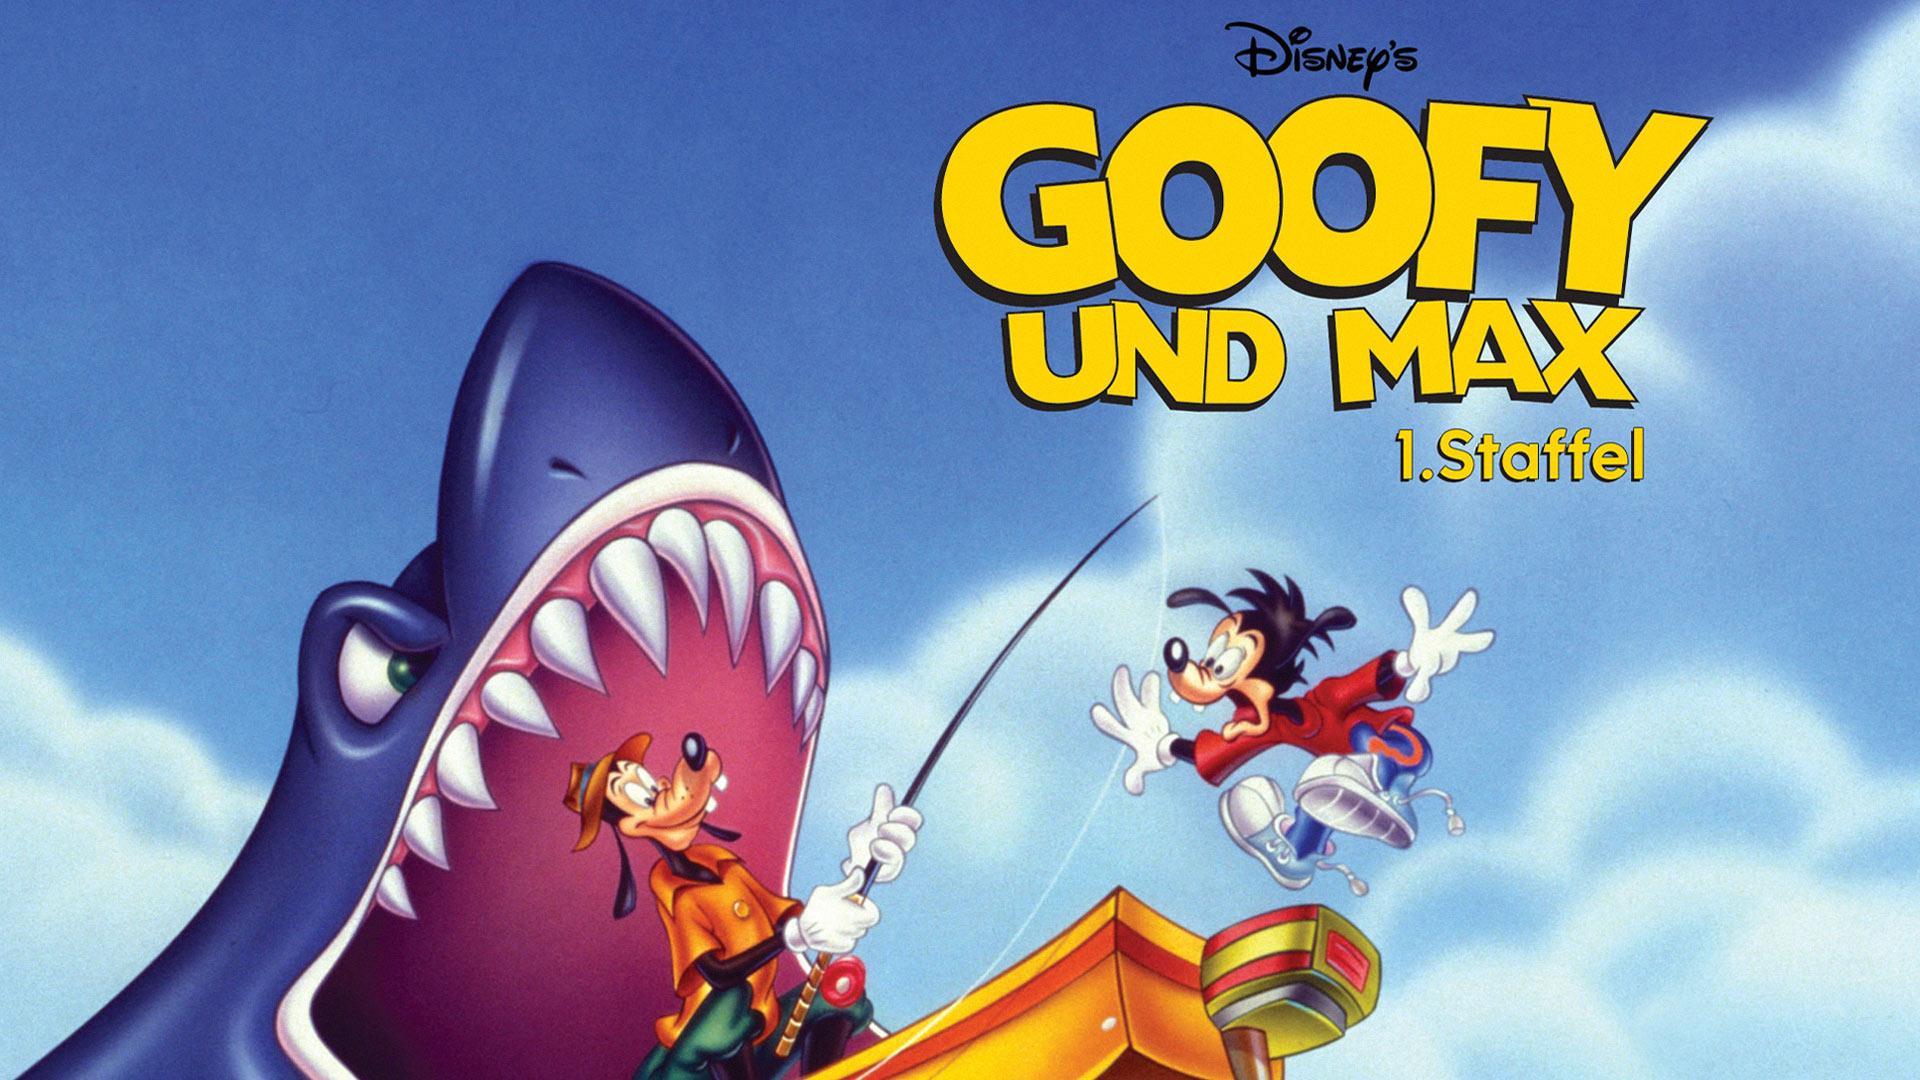 Goofy und Max - Staffel 1 Teil 1